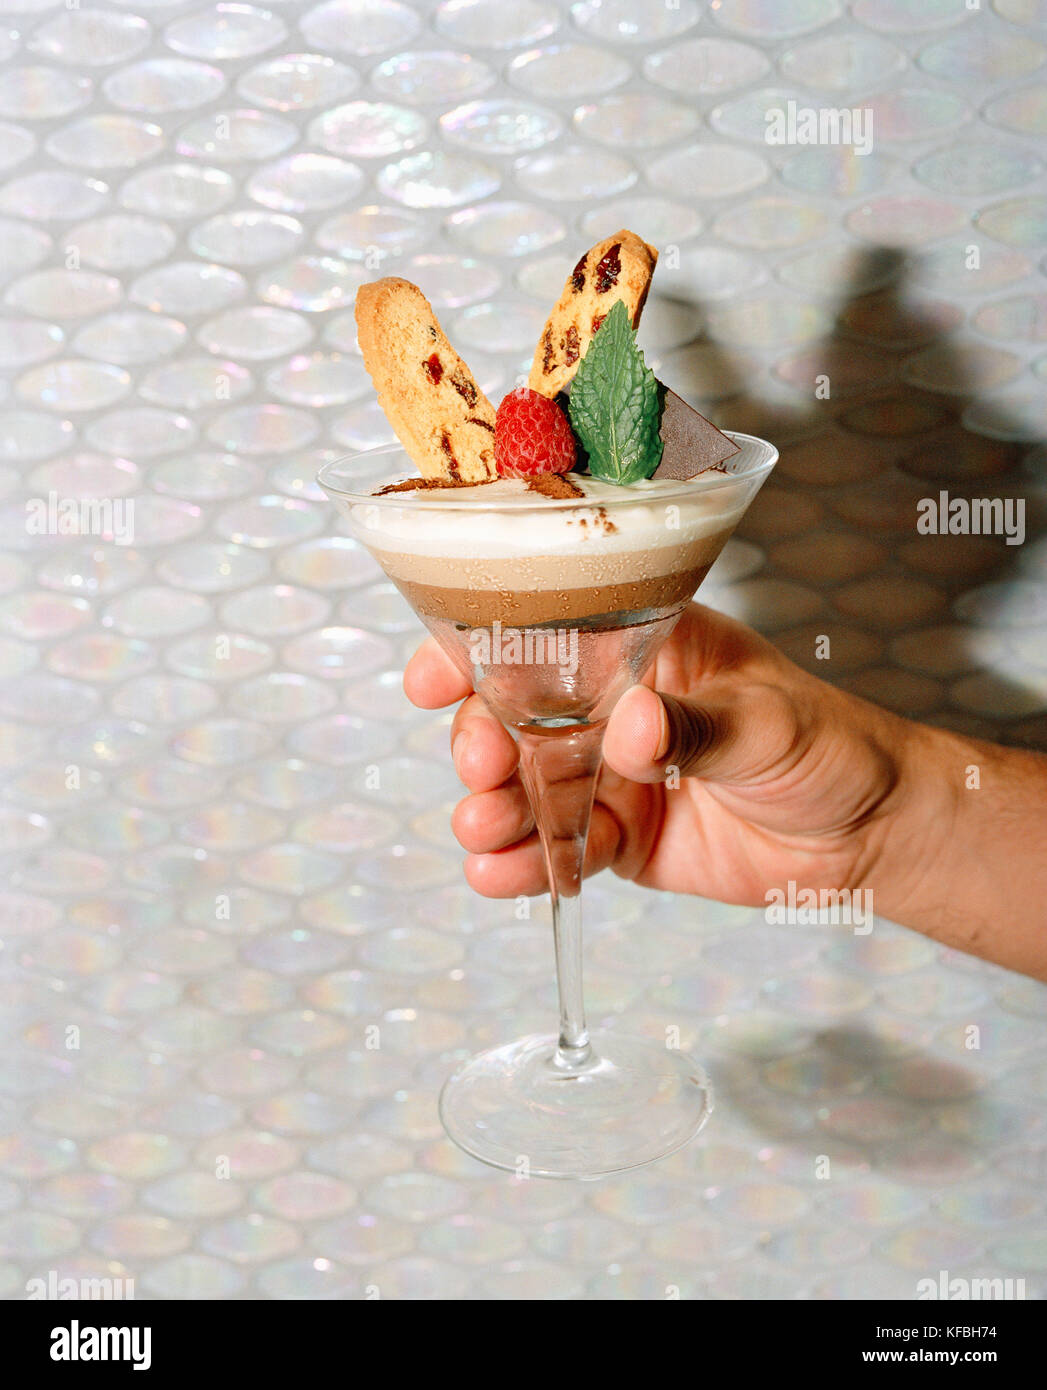 MEXICO, Punta Mita, human hand holding chocolate mousse dessert at cafe des artistes - Stock Image